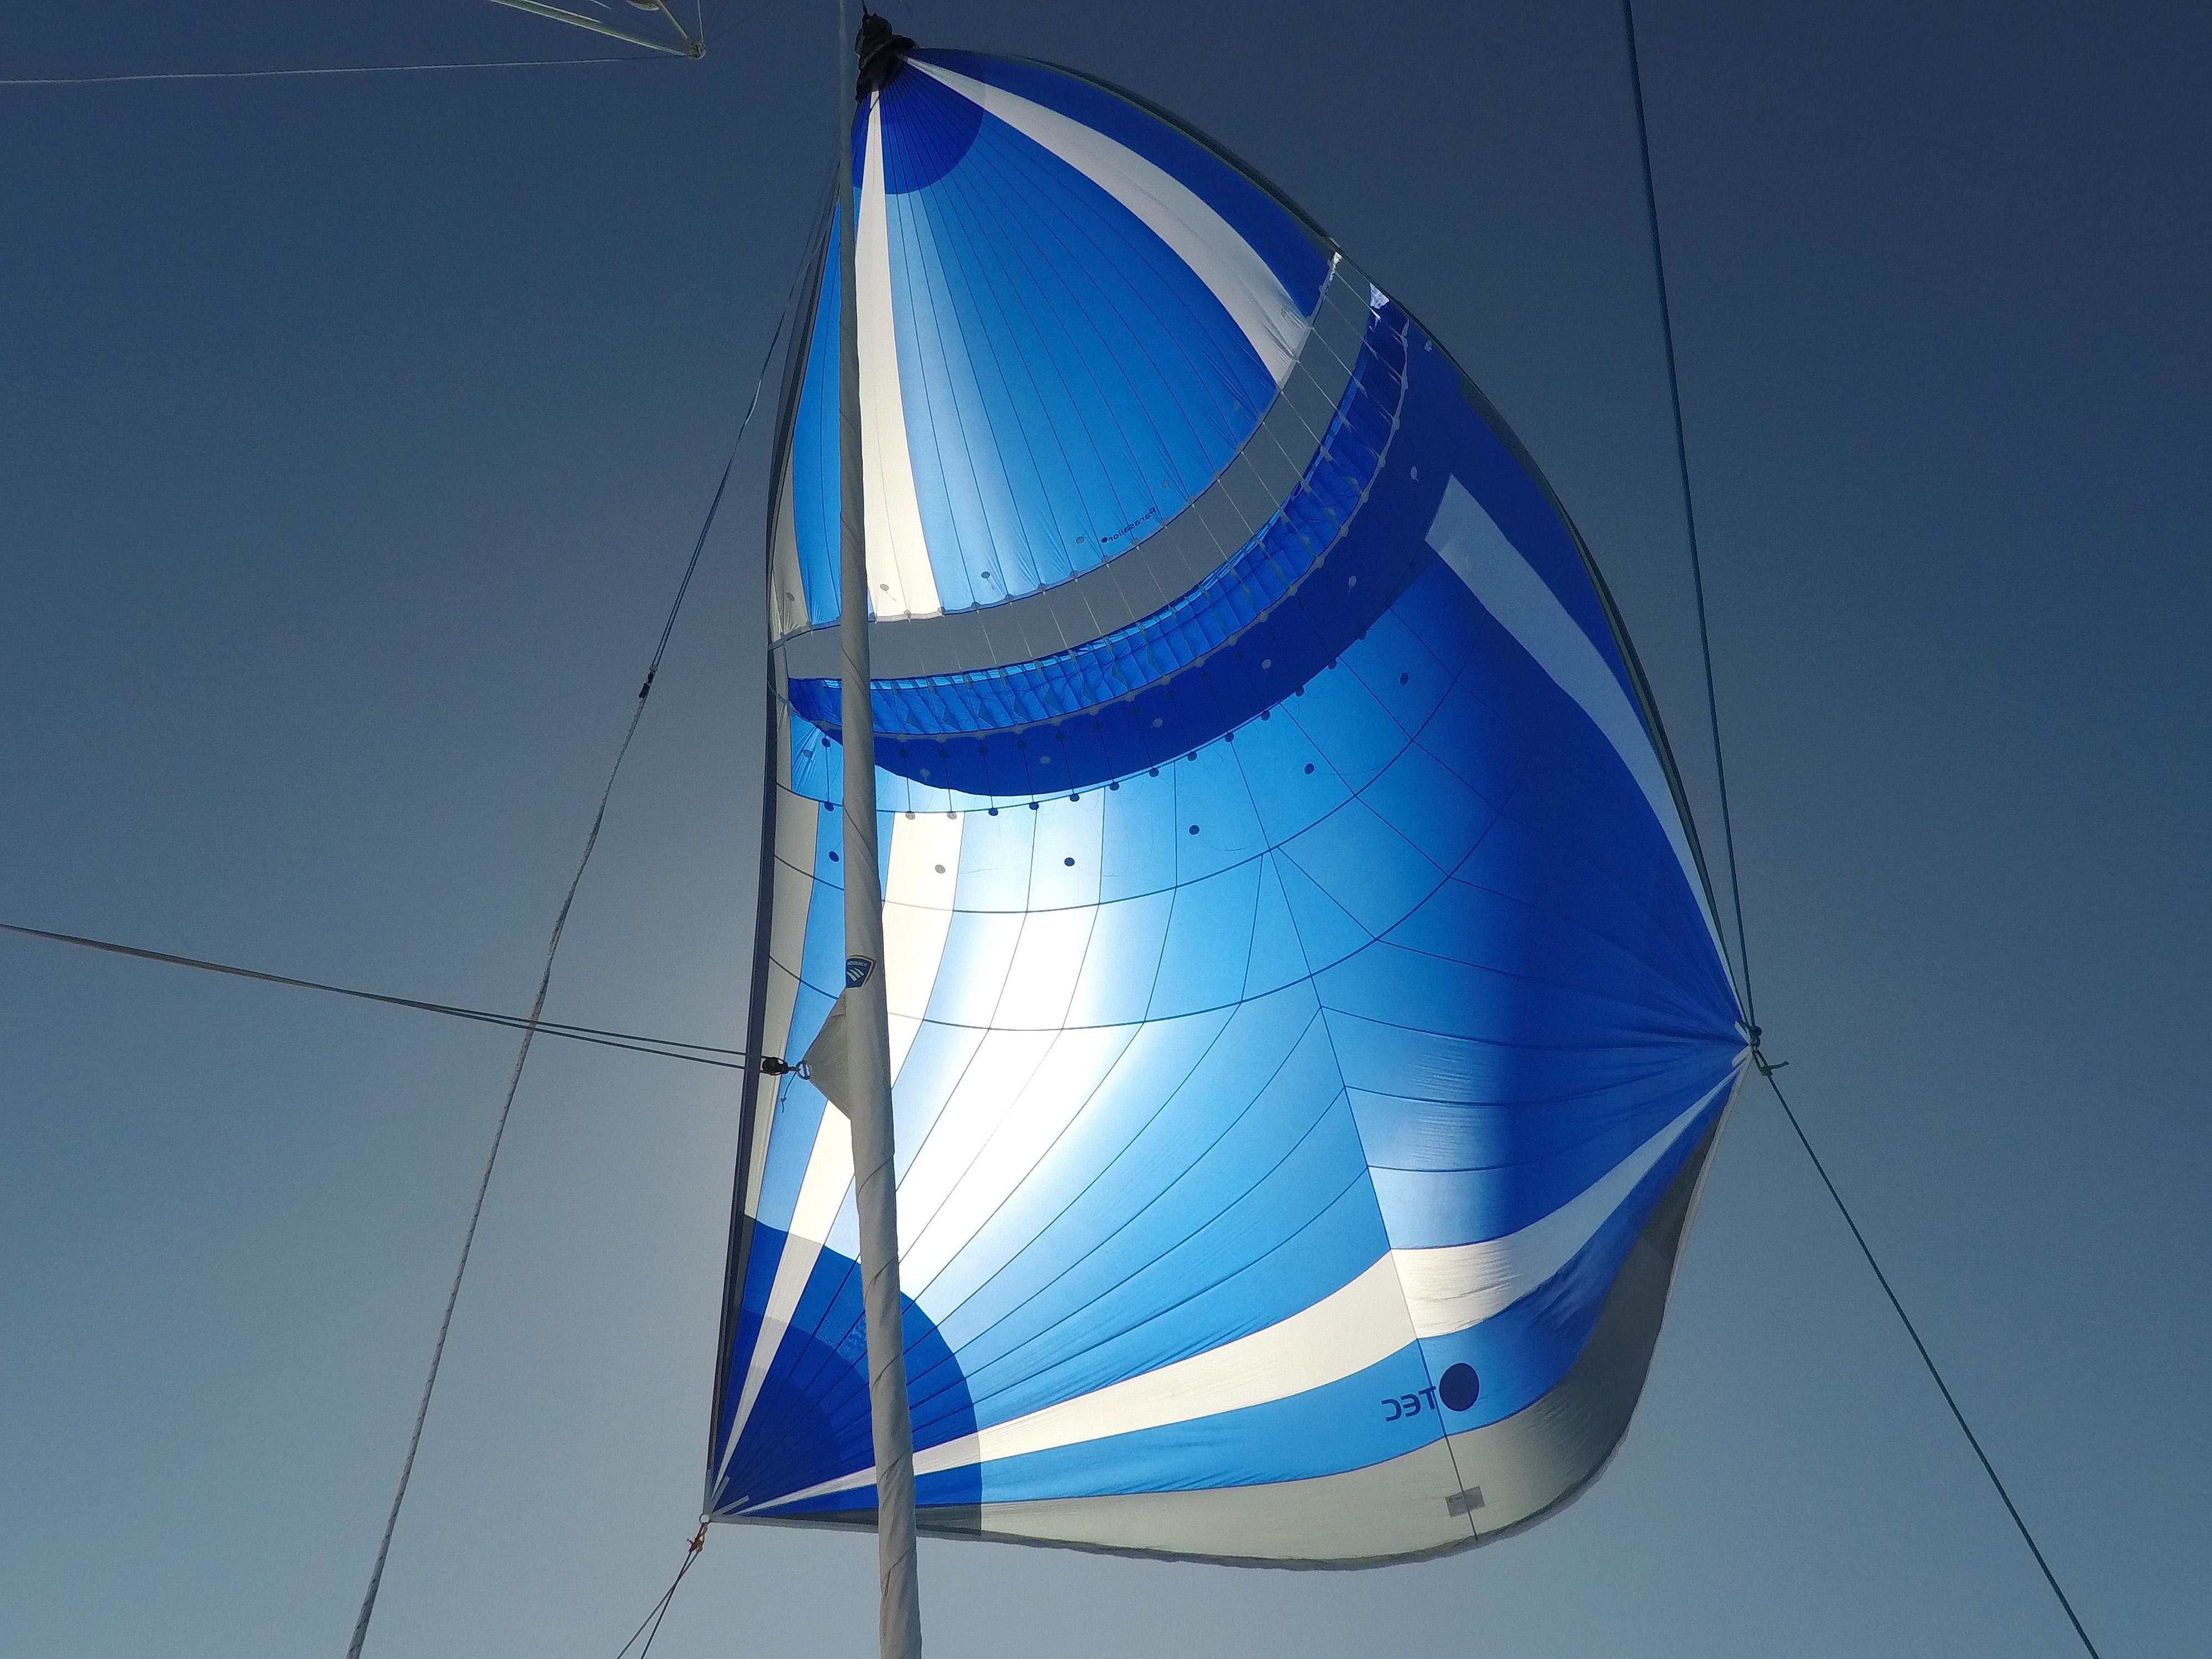 Parasail S/V Vega katamaran catamaran Norge Norway Lagoon sailing seiling boat